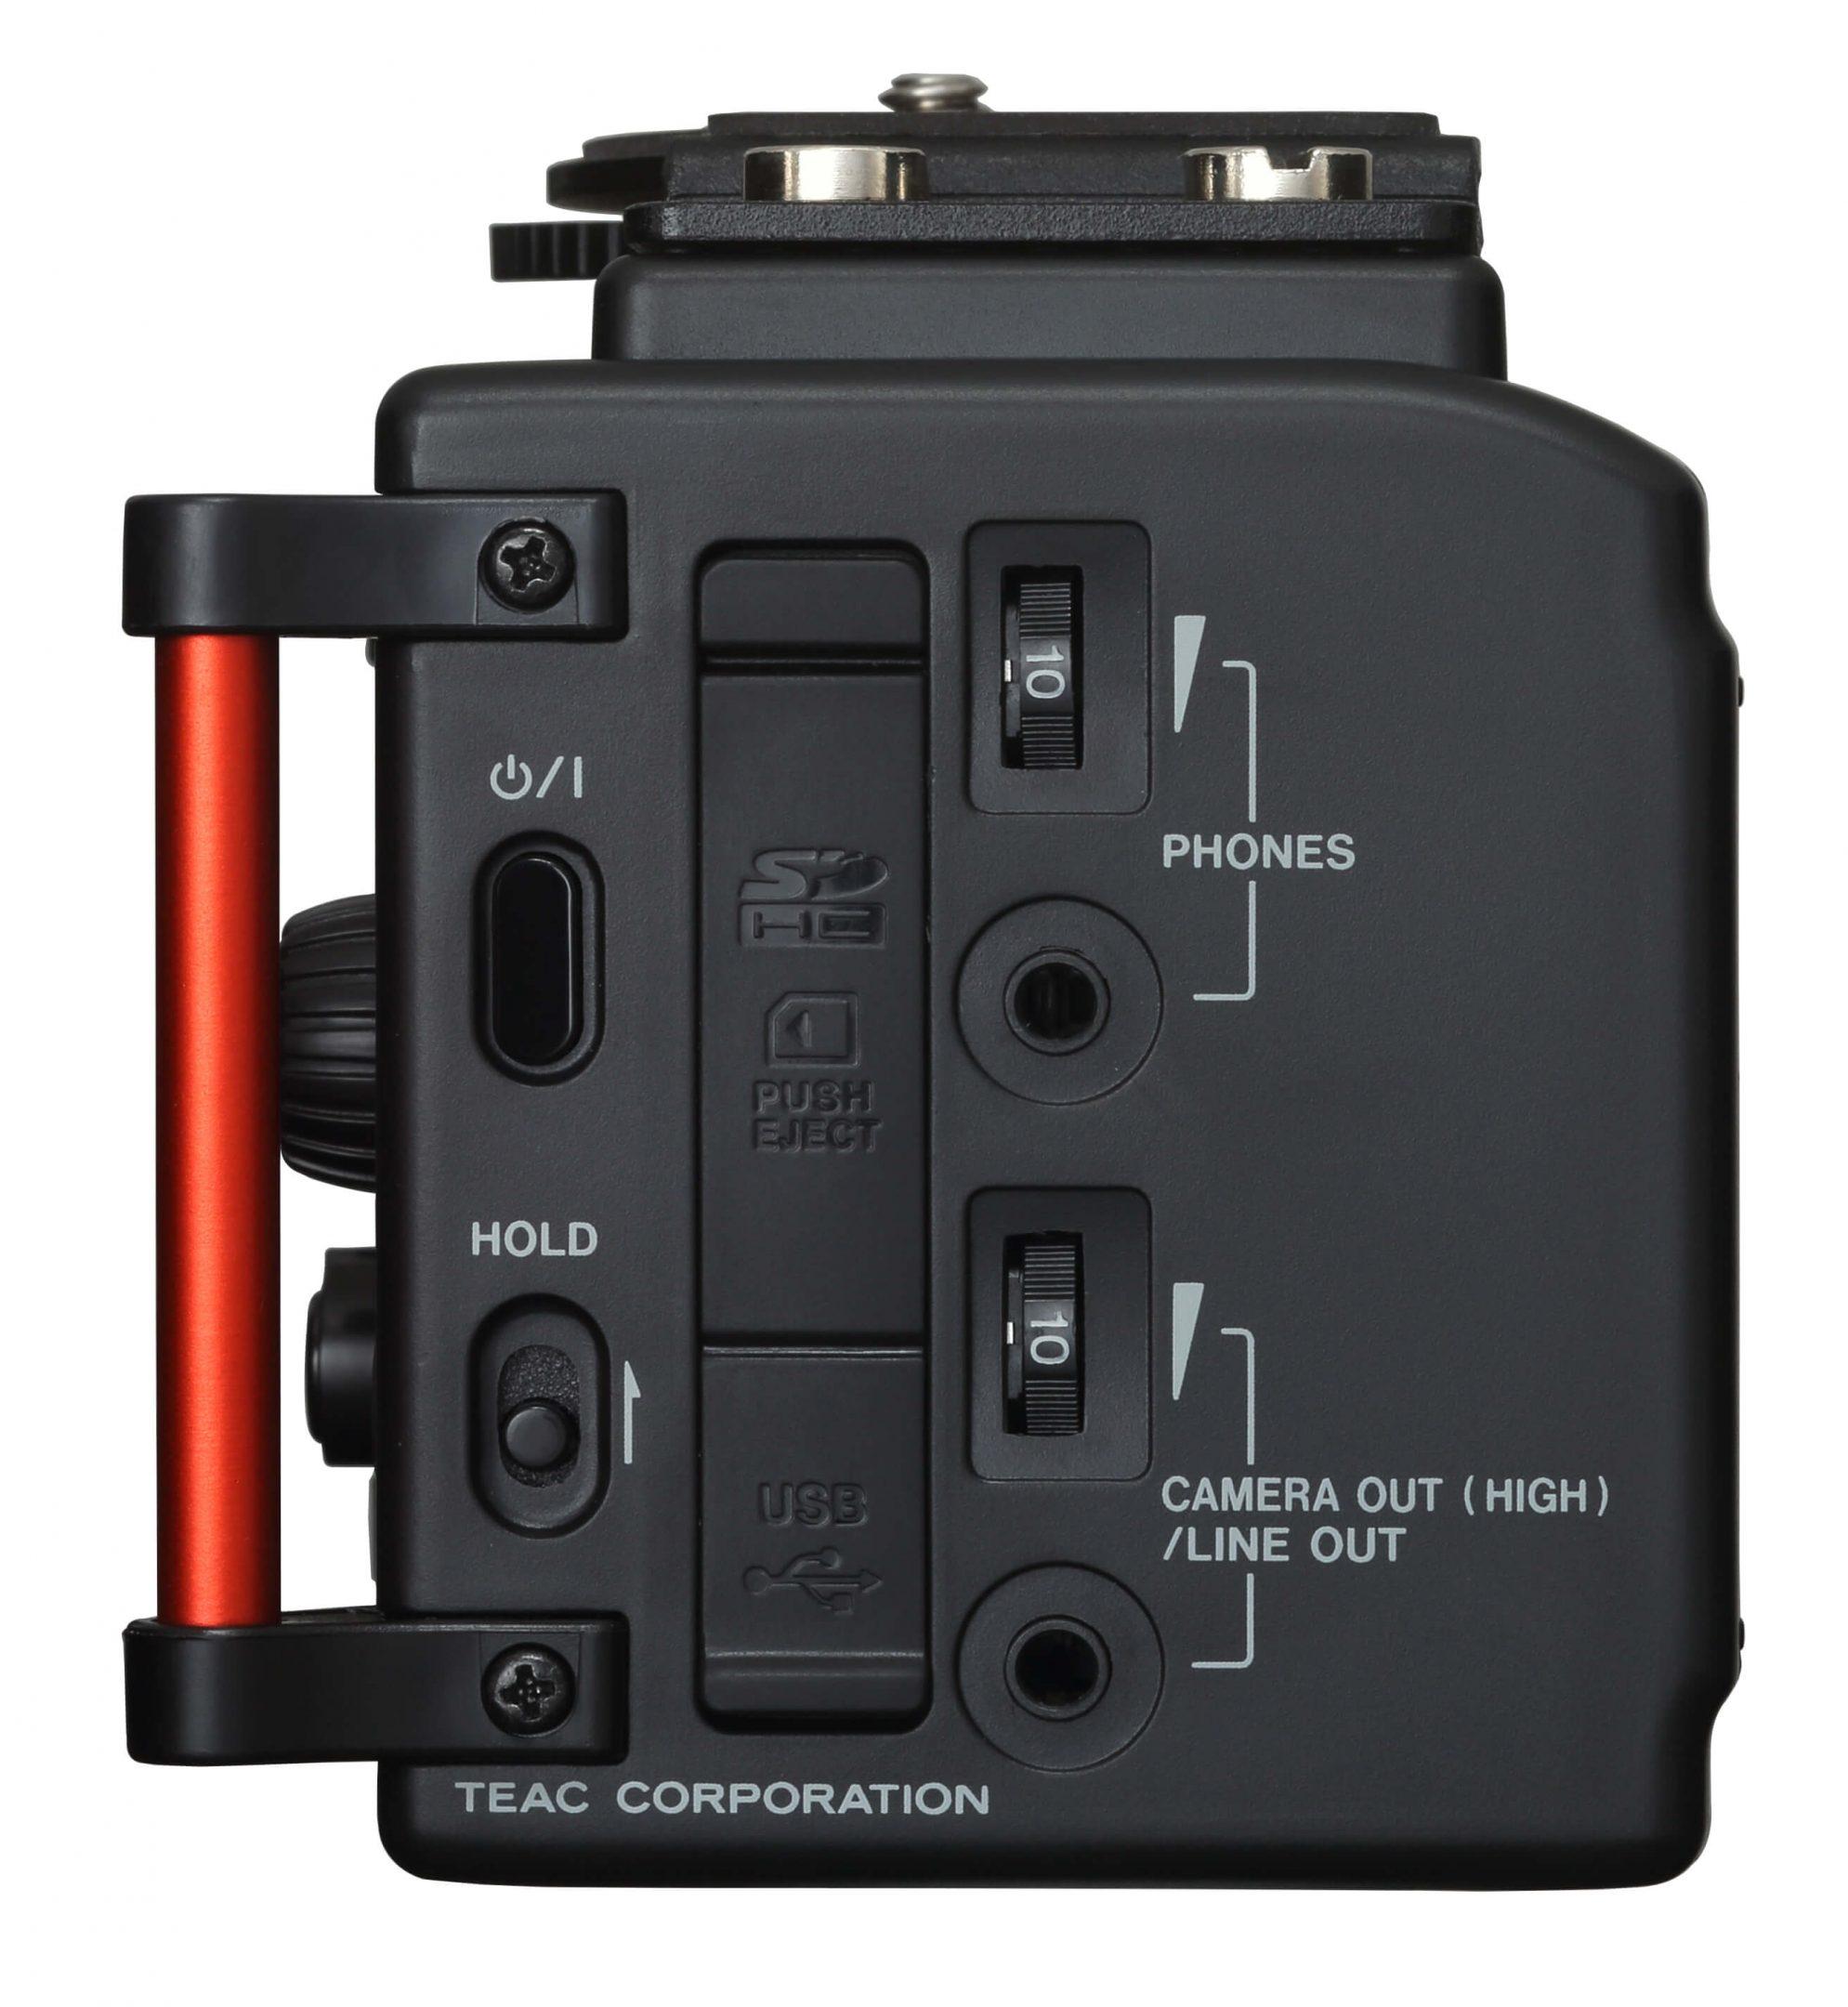 Foto van de rechterkant van de Tascam DR-60D mk2 audiorecorder.